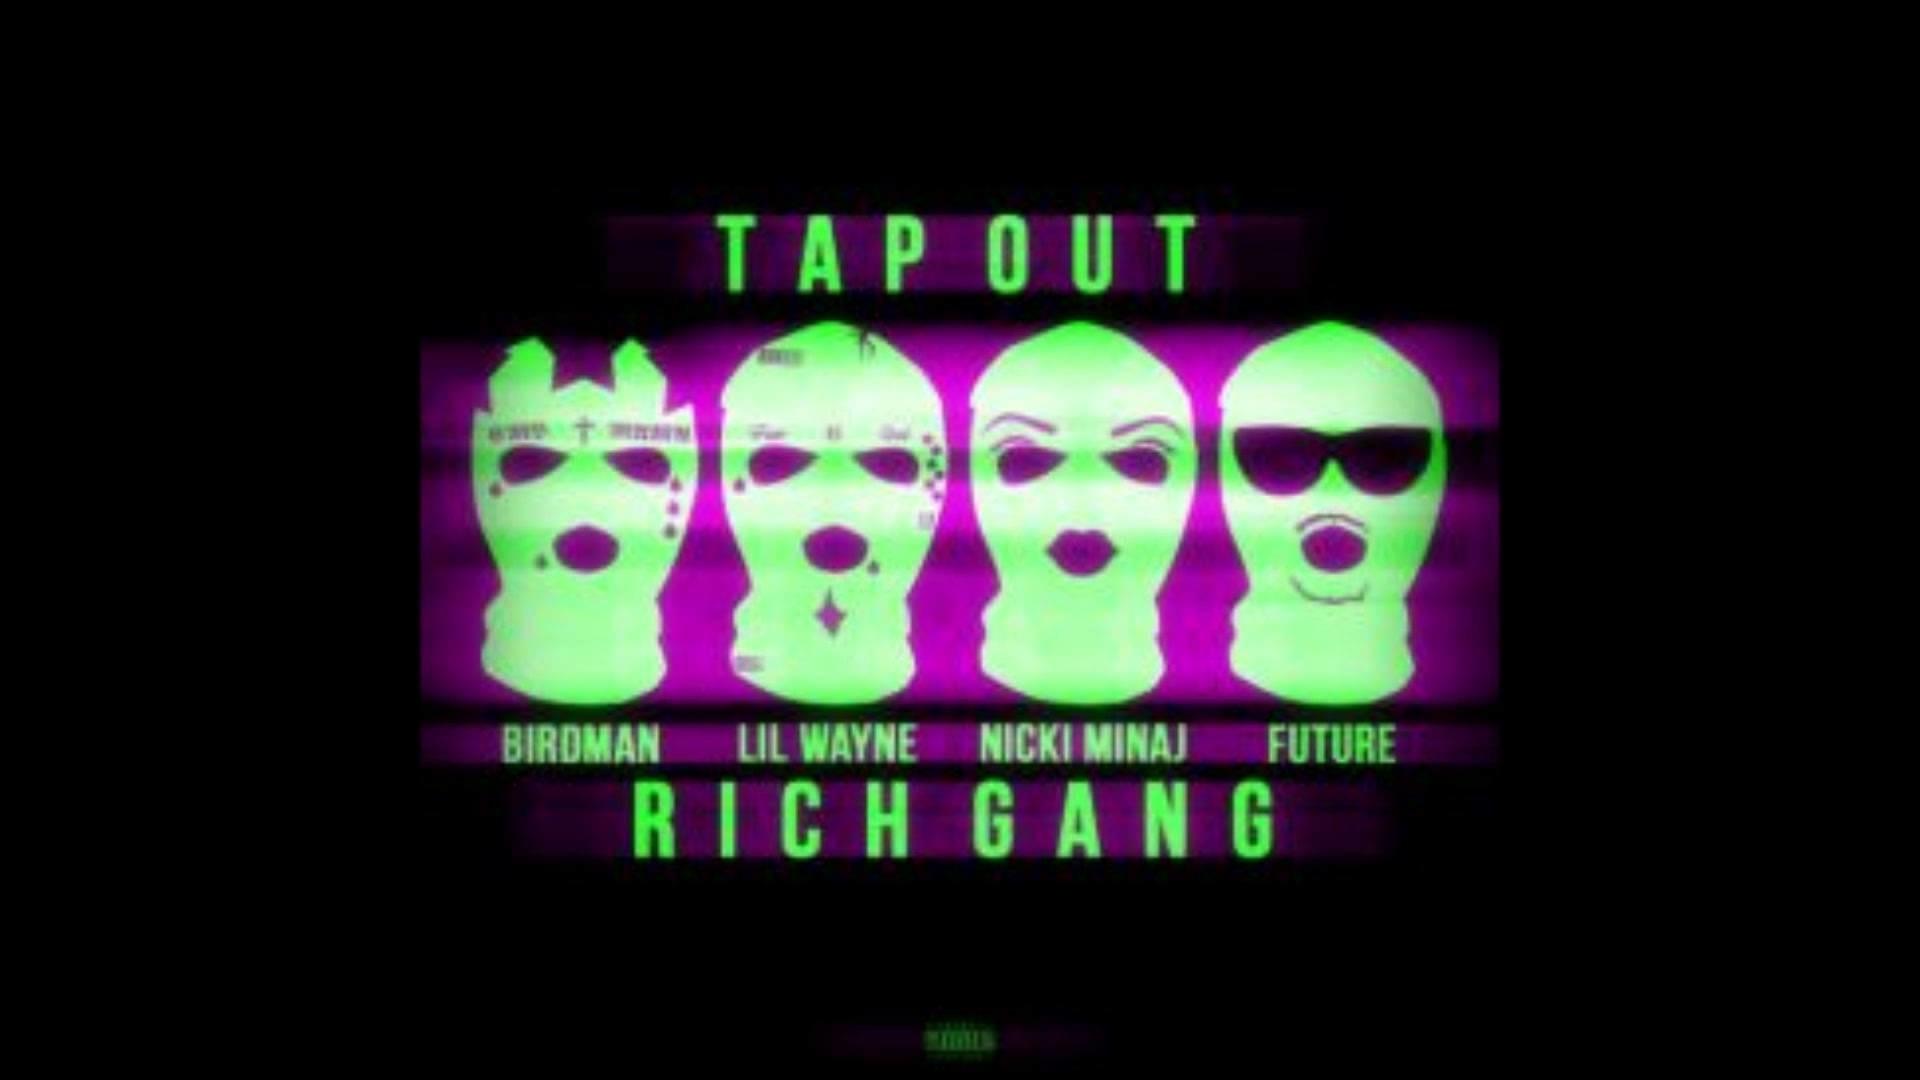 Rich Gang (Birdman, Nicki Minaj, Lil Wayne, Future & Mack Maine) – Tapout  (Slowed Down) – YouTube